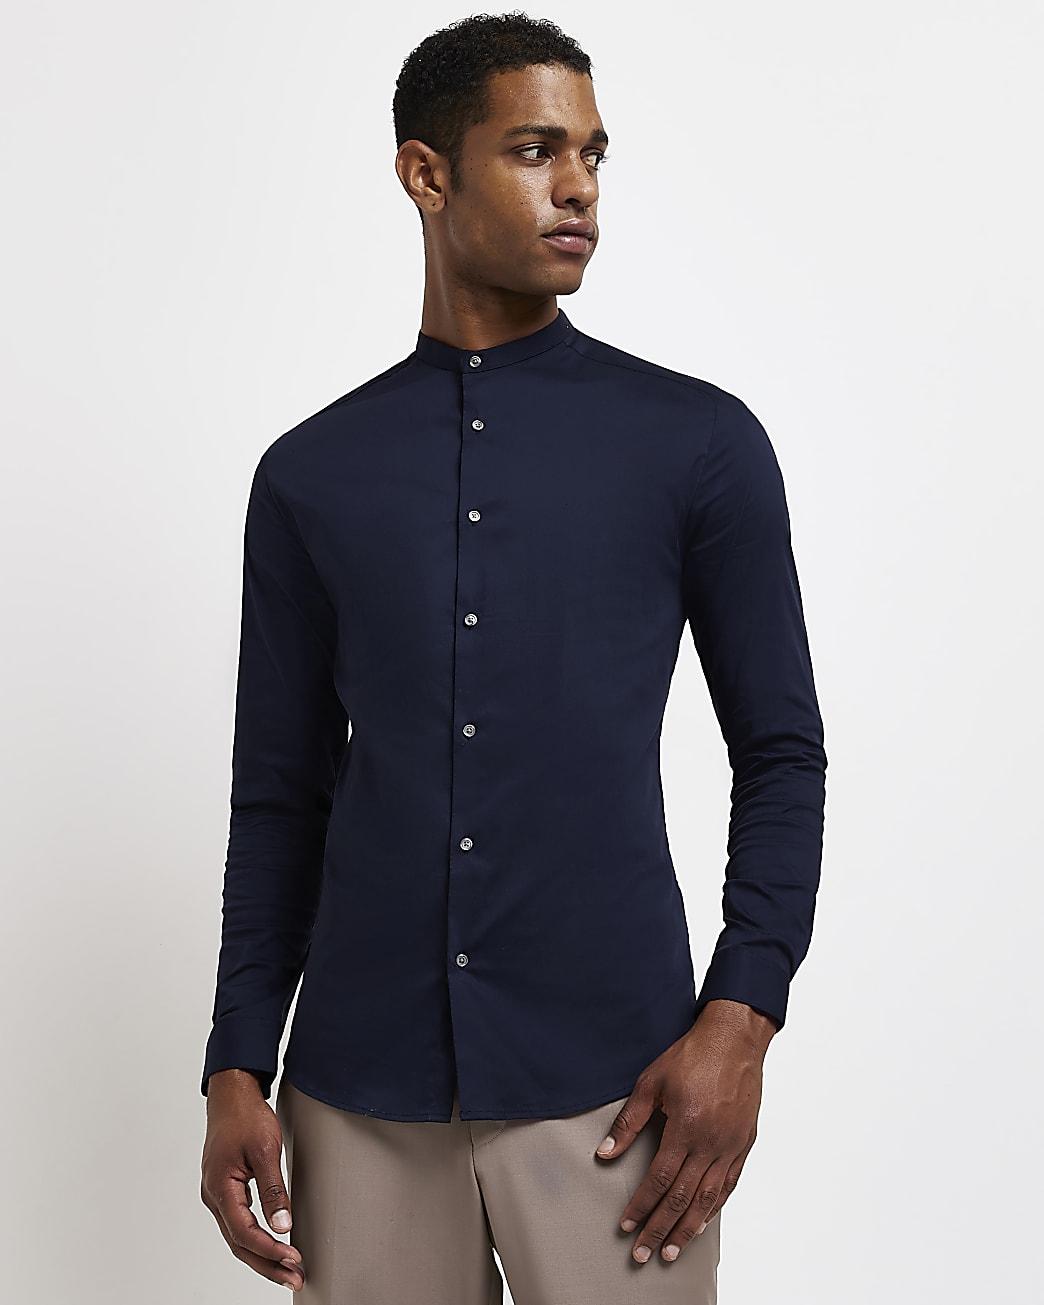 Navy muscle fit grandad long sleeve shirt